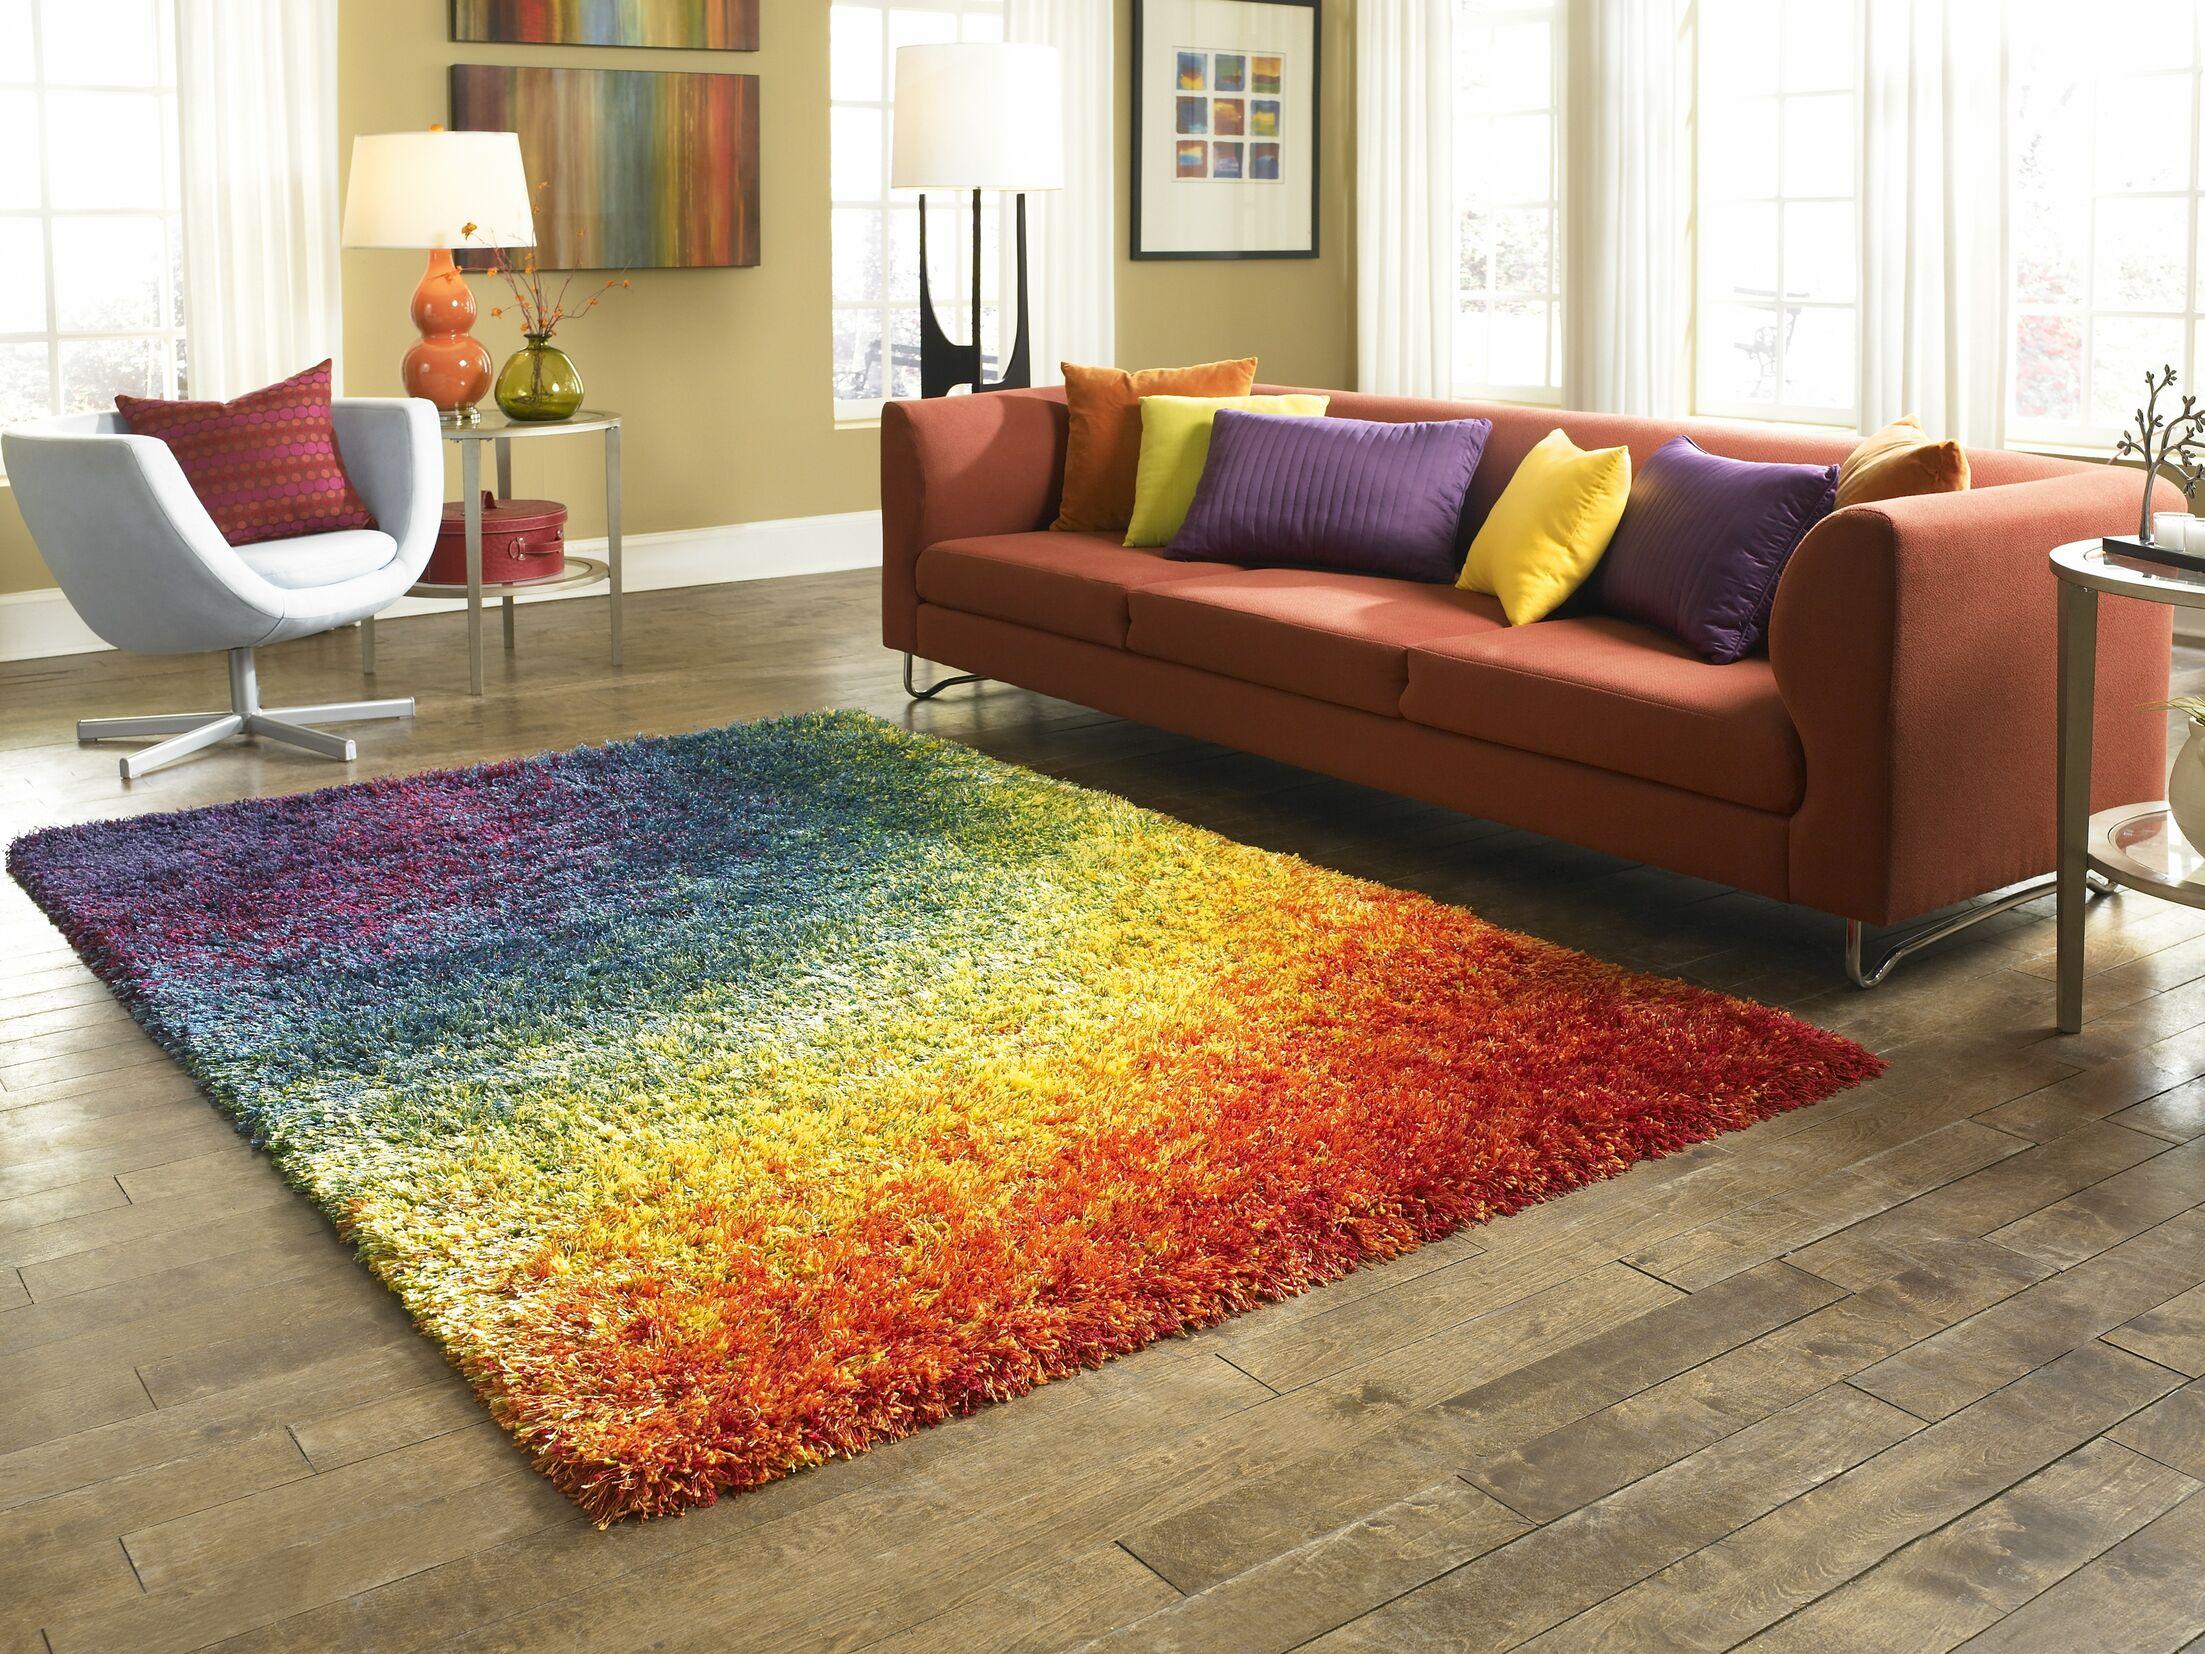 Fitzsimons Purple/Green/Orange Indoor/Outdoor Area Rug Rug Size: Rectangle 3'9